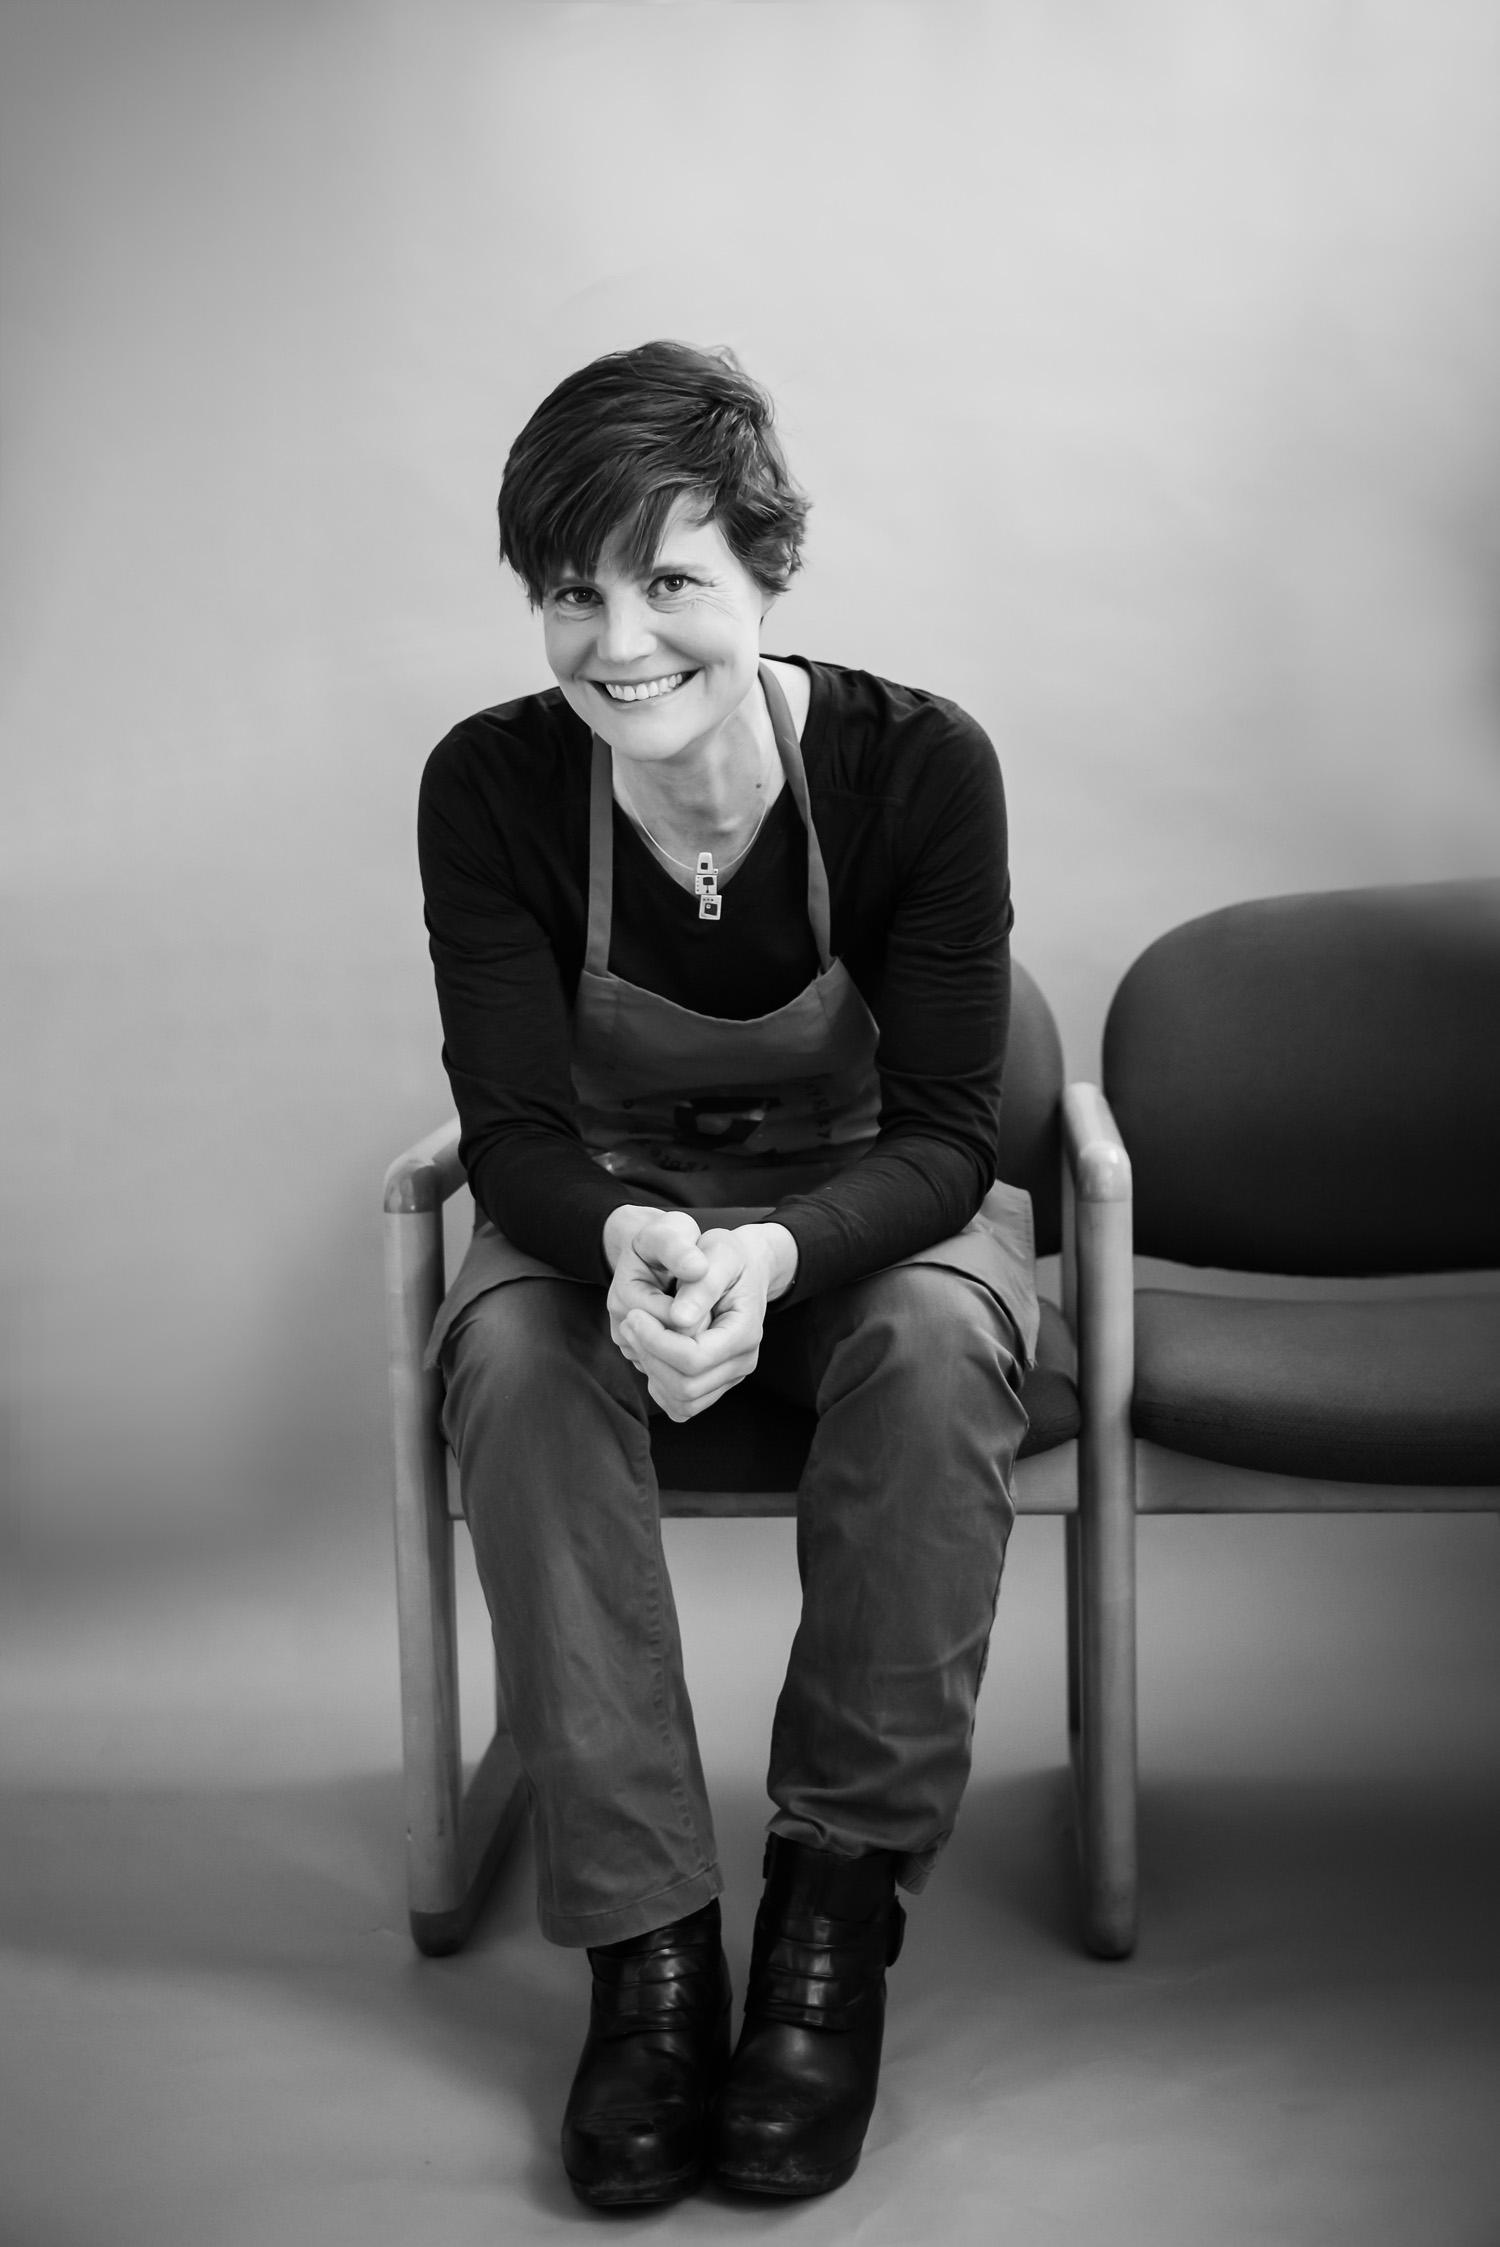 Artist Sara Tabbert